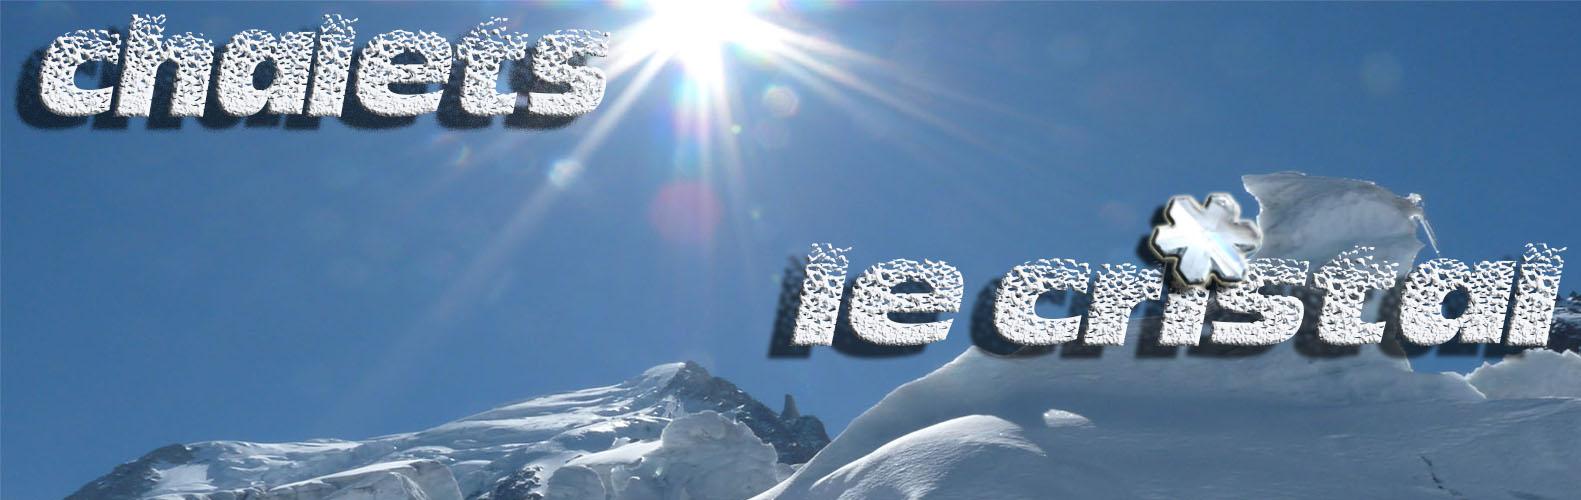 Neige & soleil...